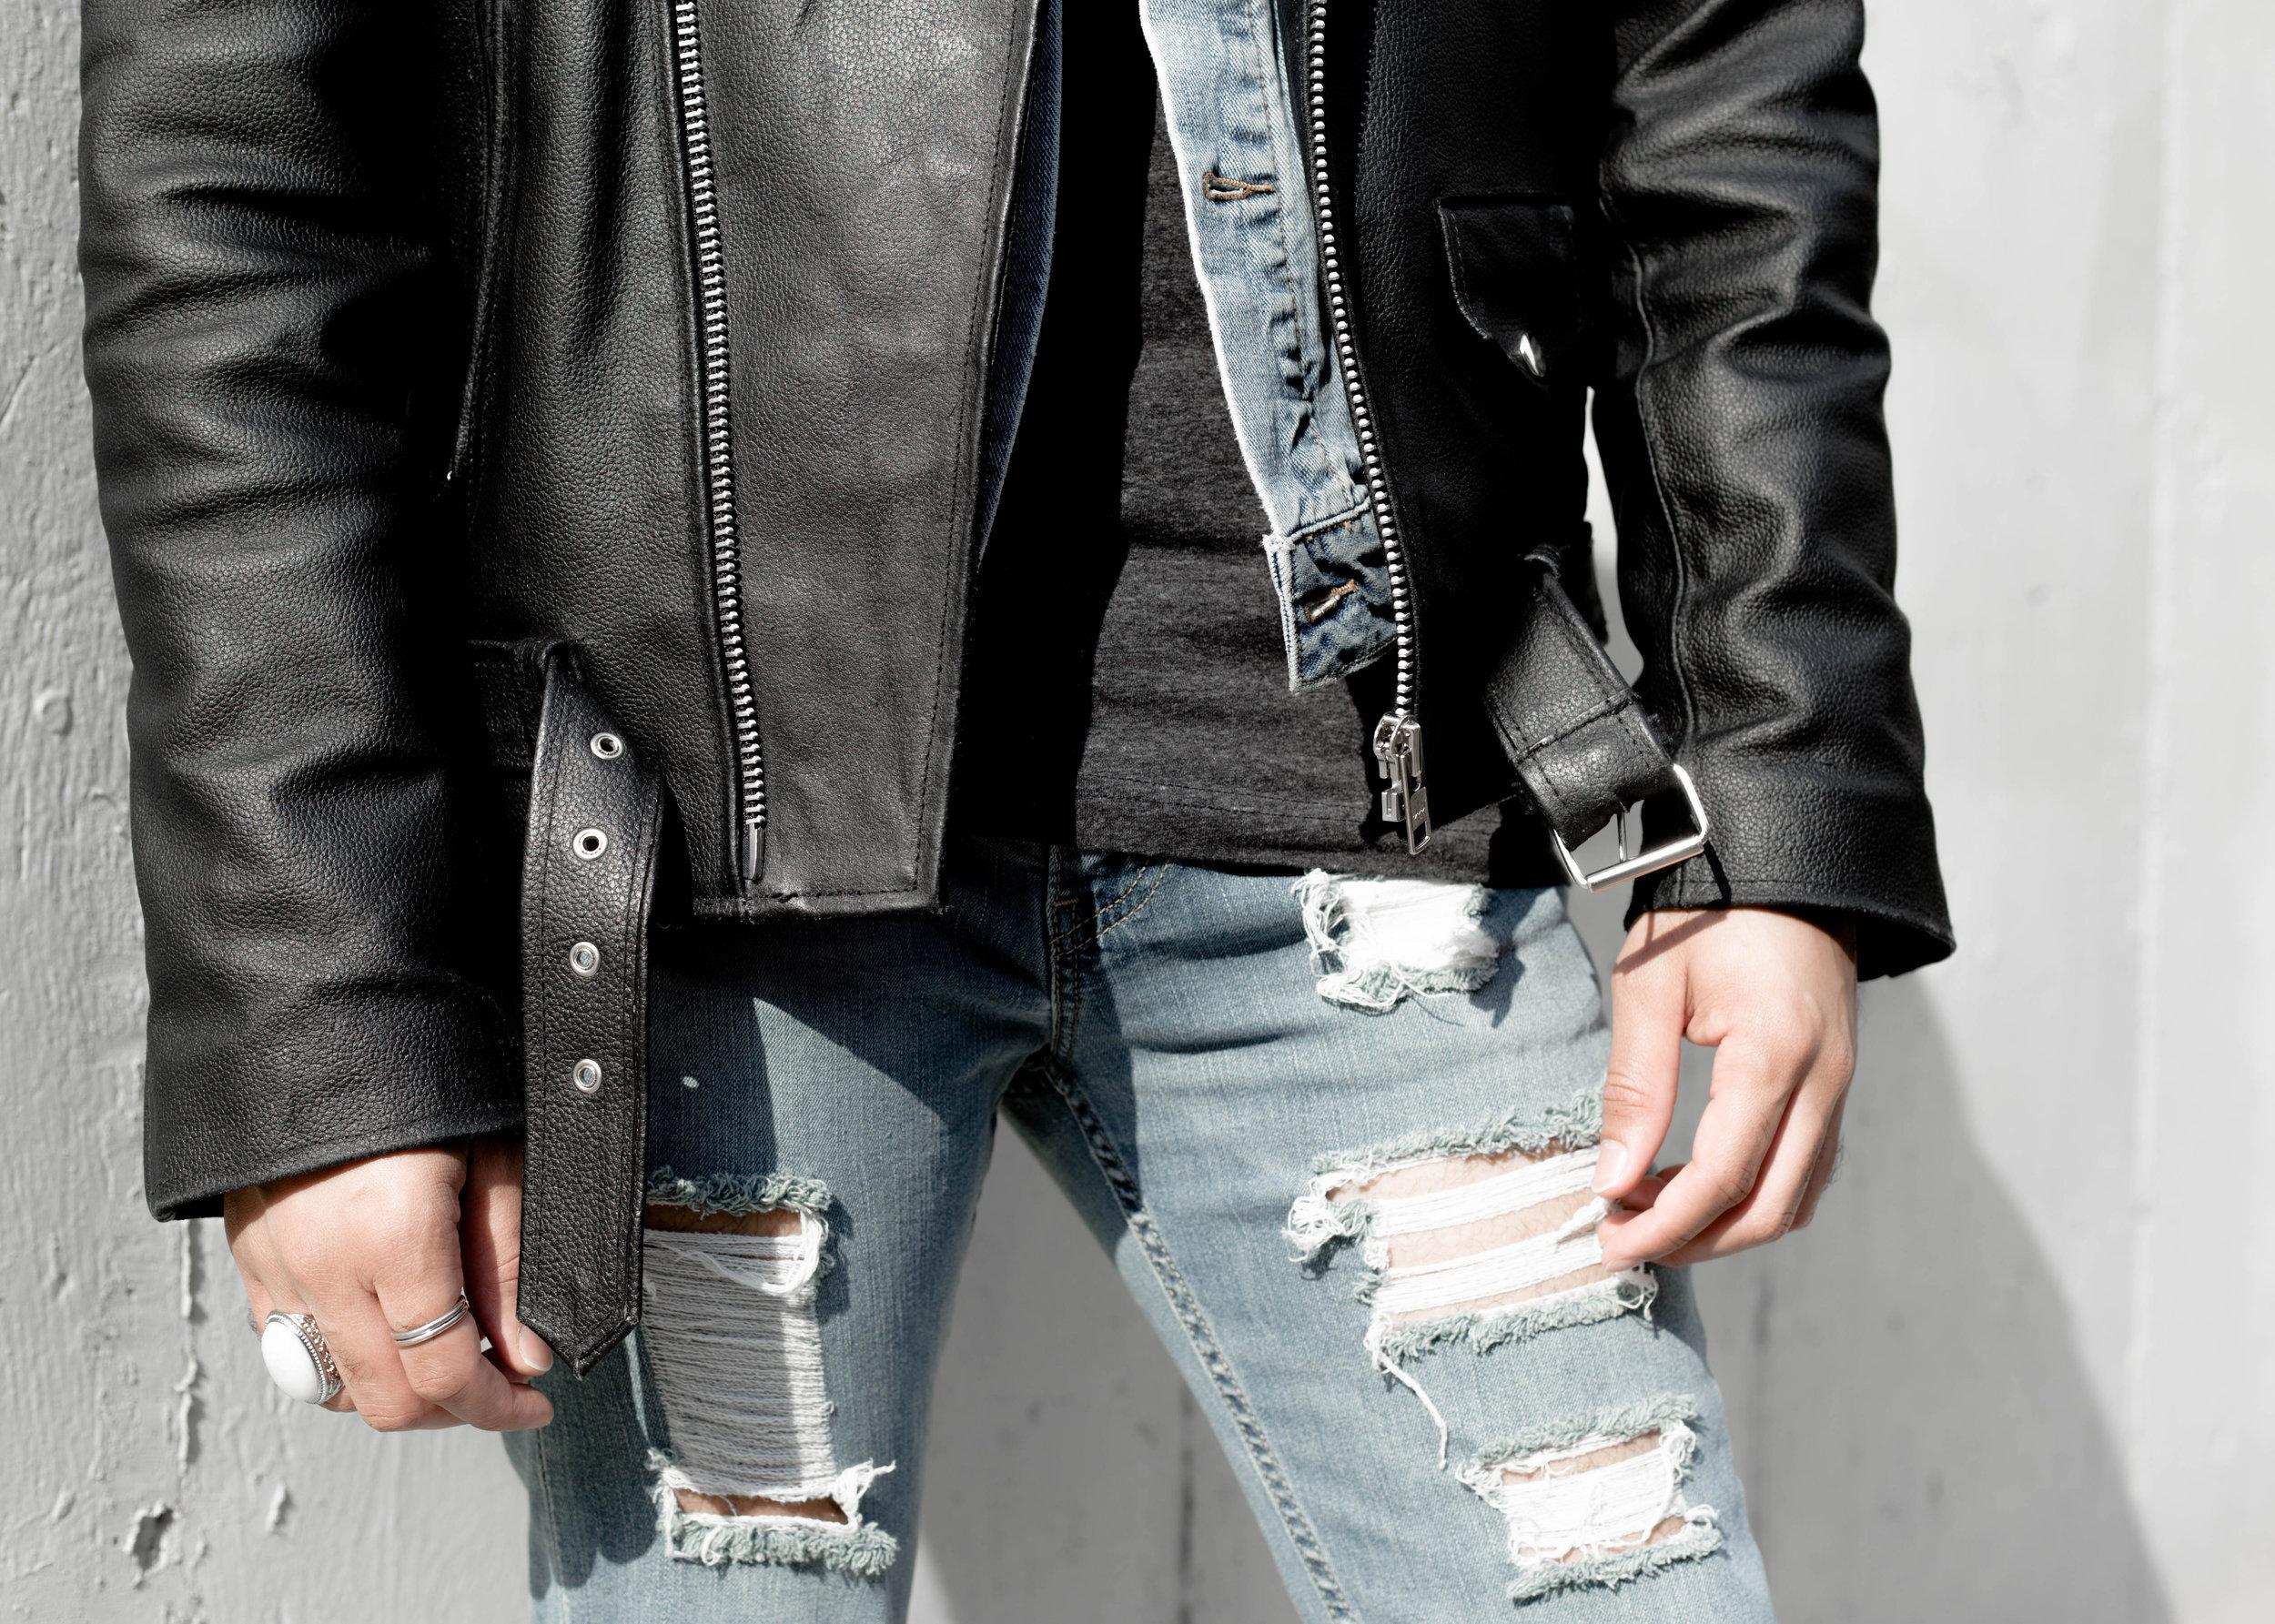 sam-c-perry-leather-jacket-denim-on-distressed-denim-detail.jpg